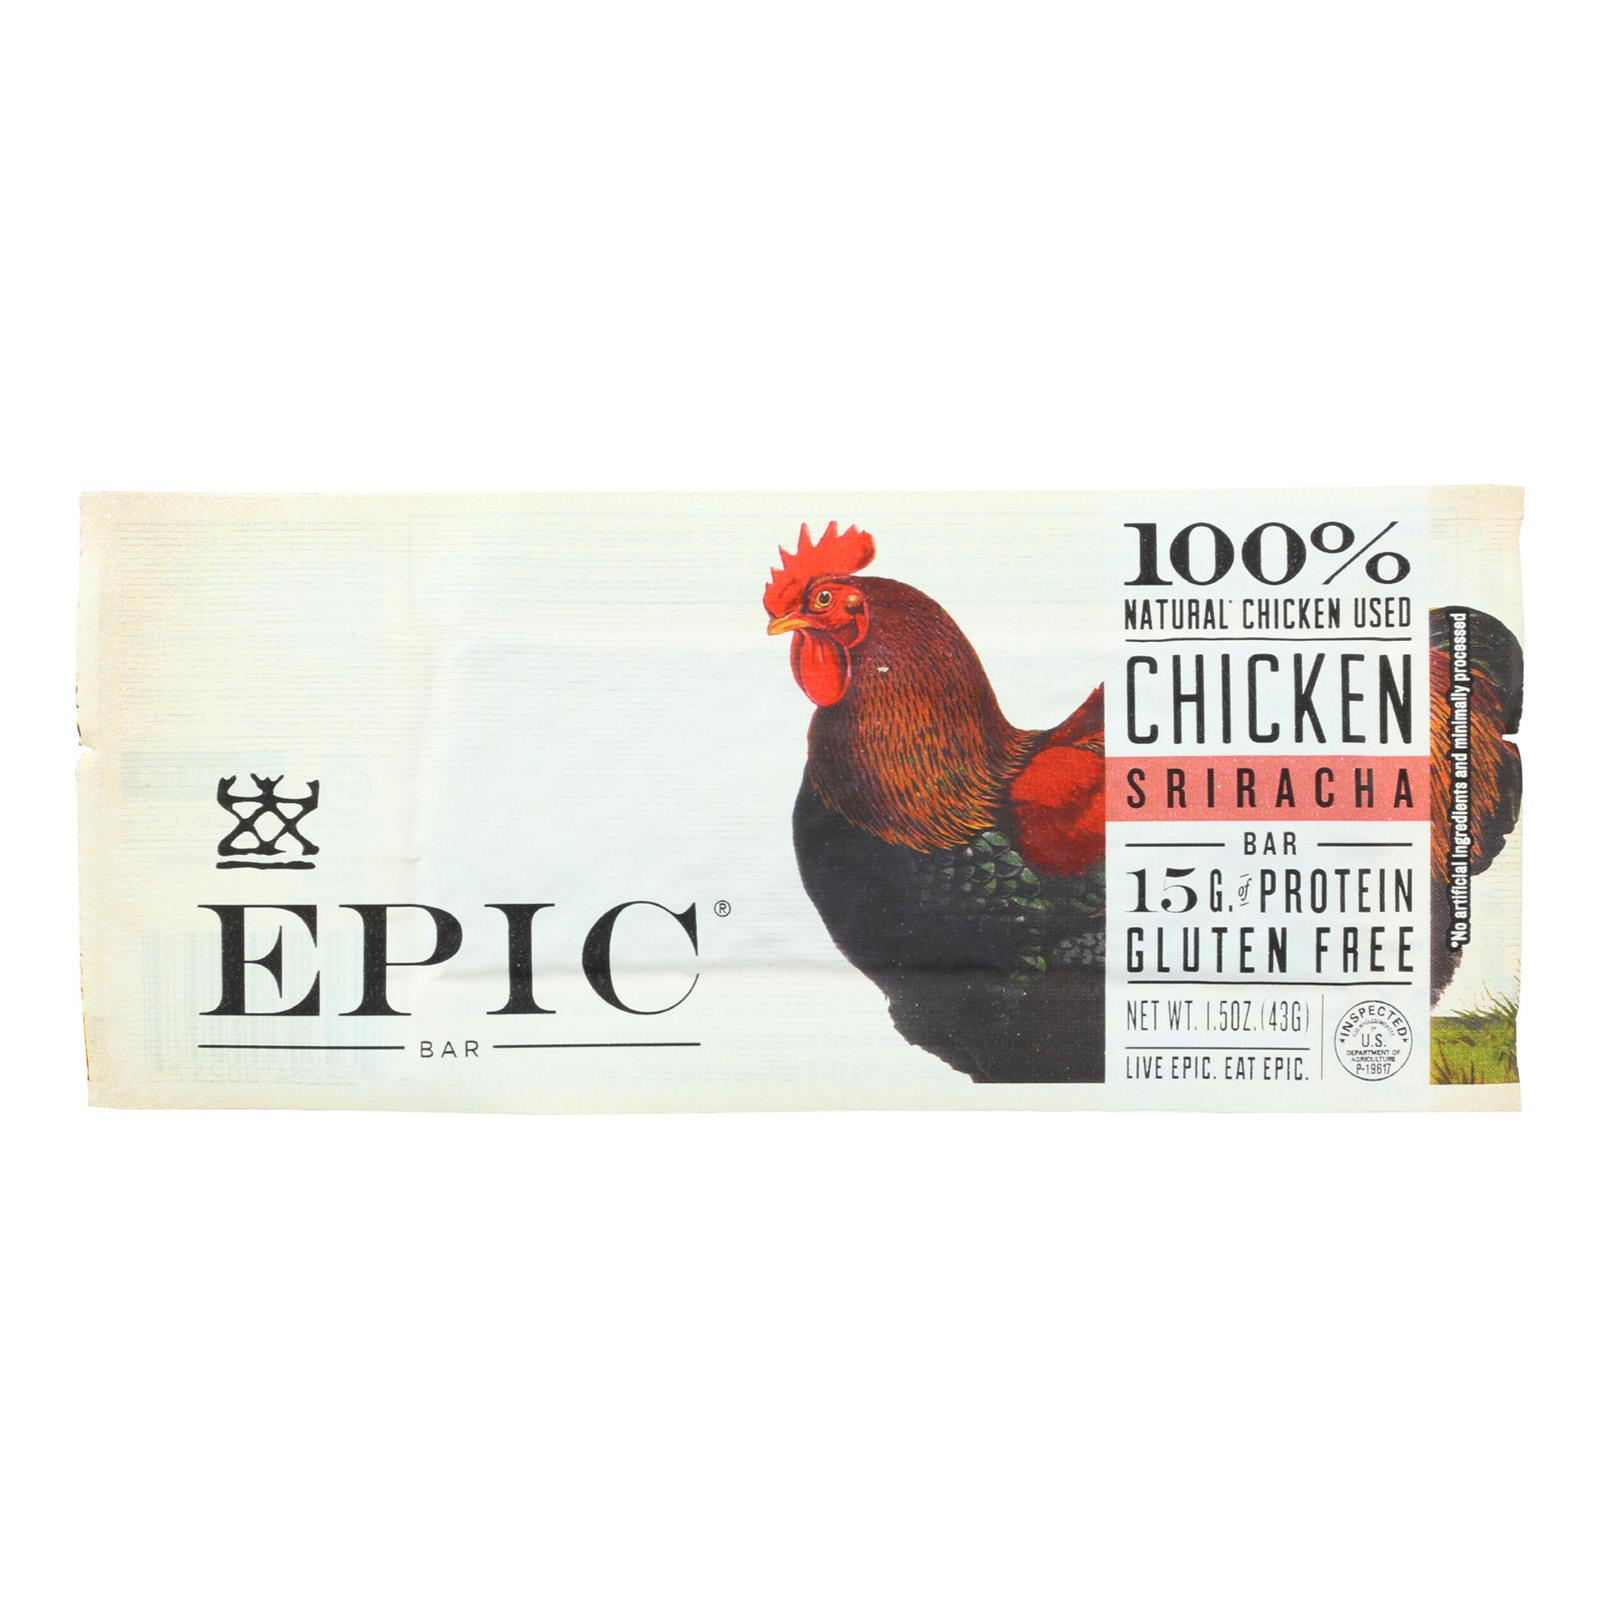 Epic Bar - Chicken Sriracha - 1.5 Oz Bars - Case Of 12